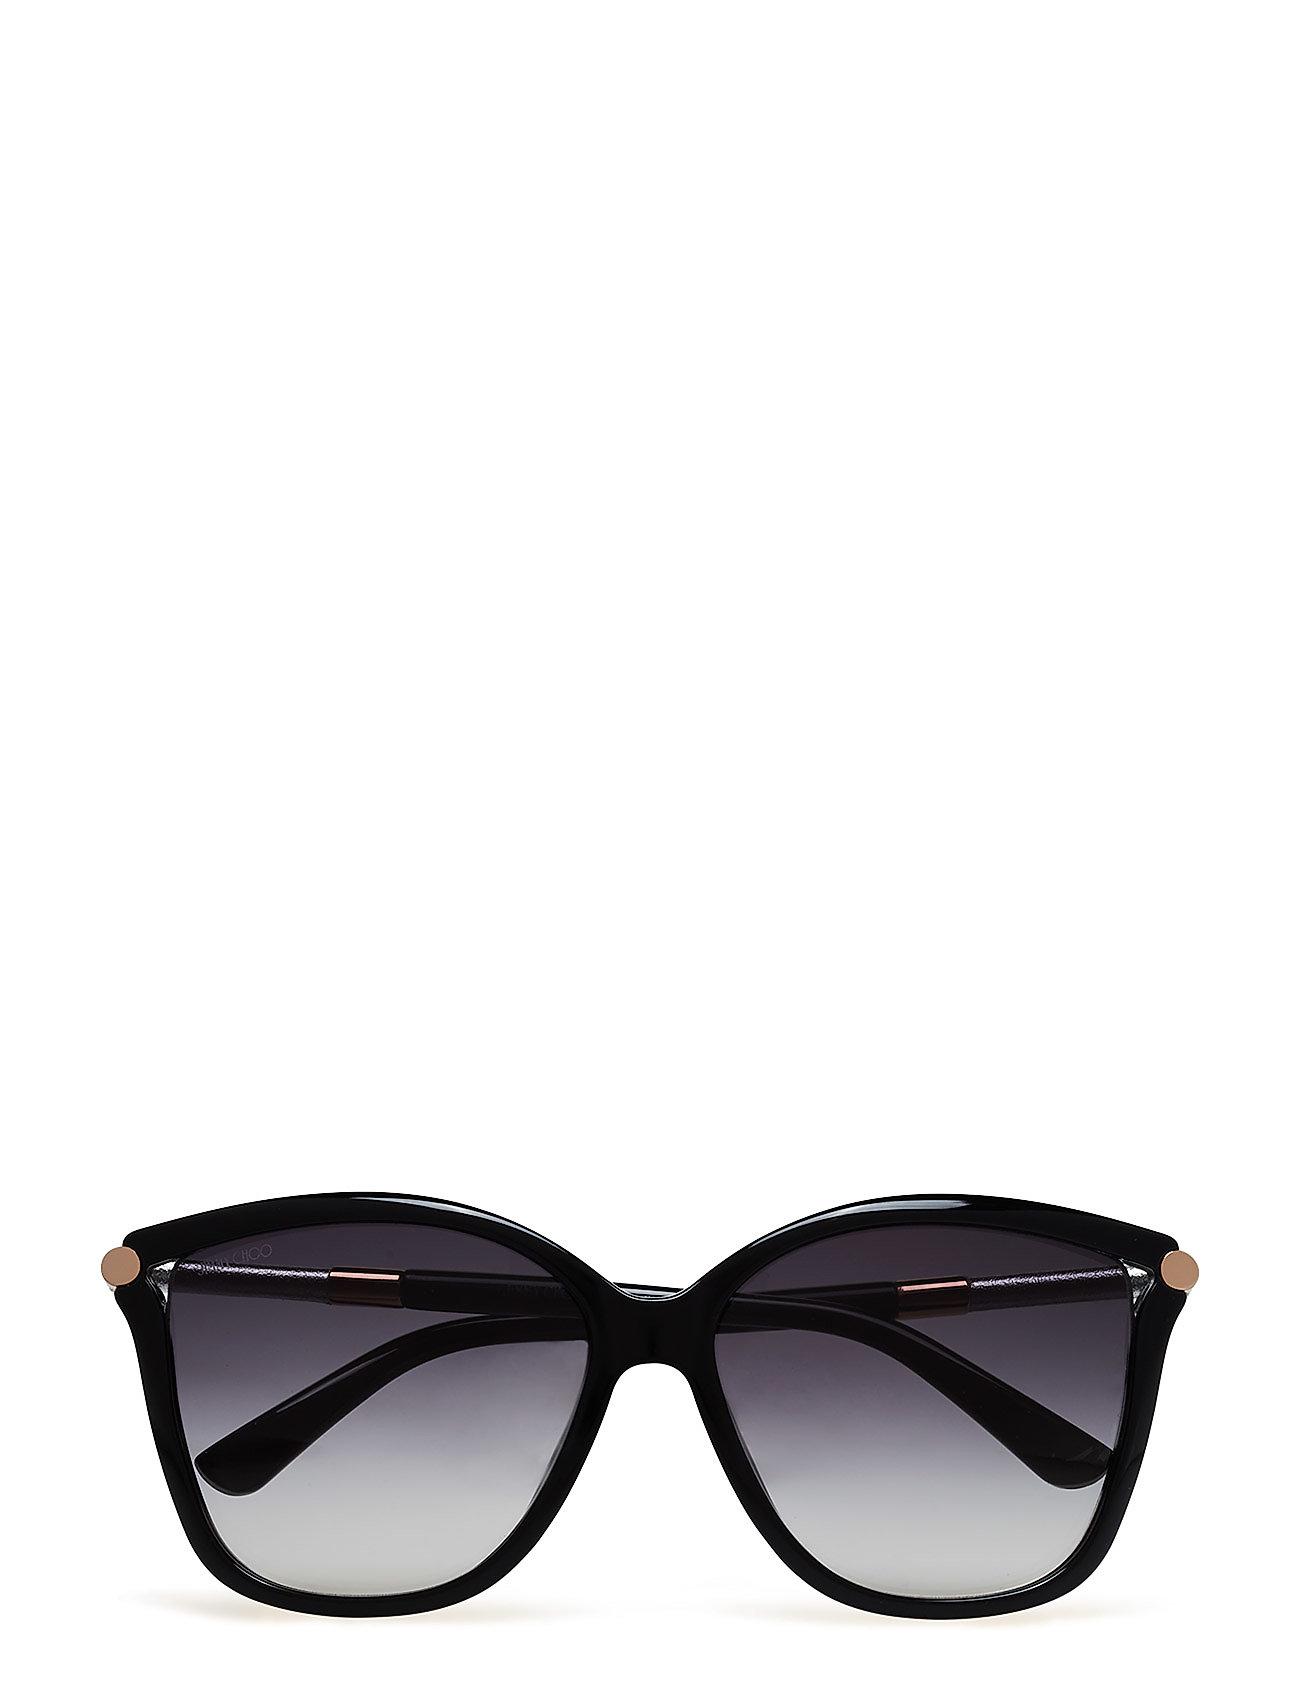 076b2ecfbc64 Shop Tatti S Jimmy Choo Sunglasses Solbriller i Sort til Kvinder hos ...